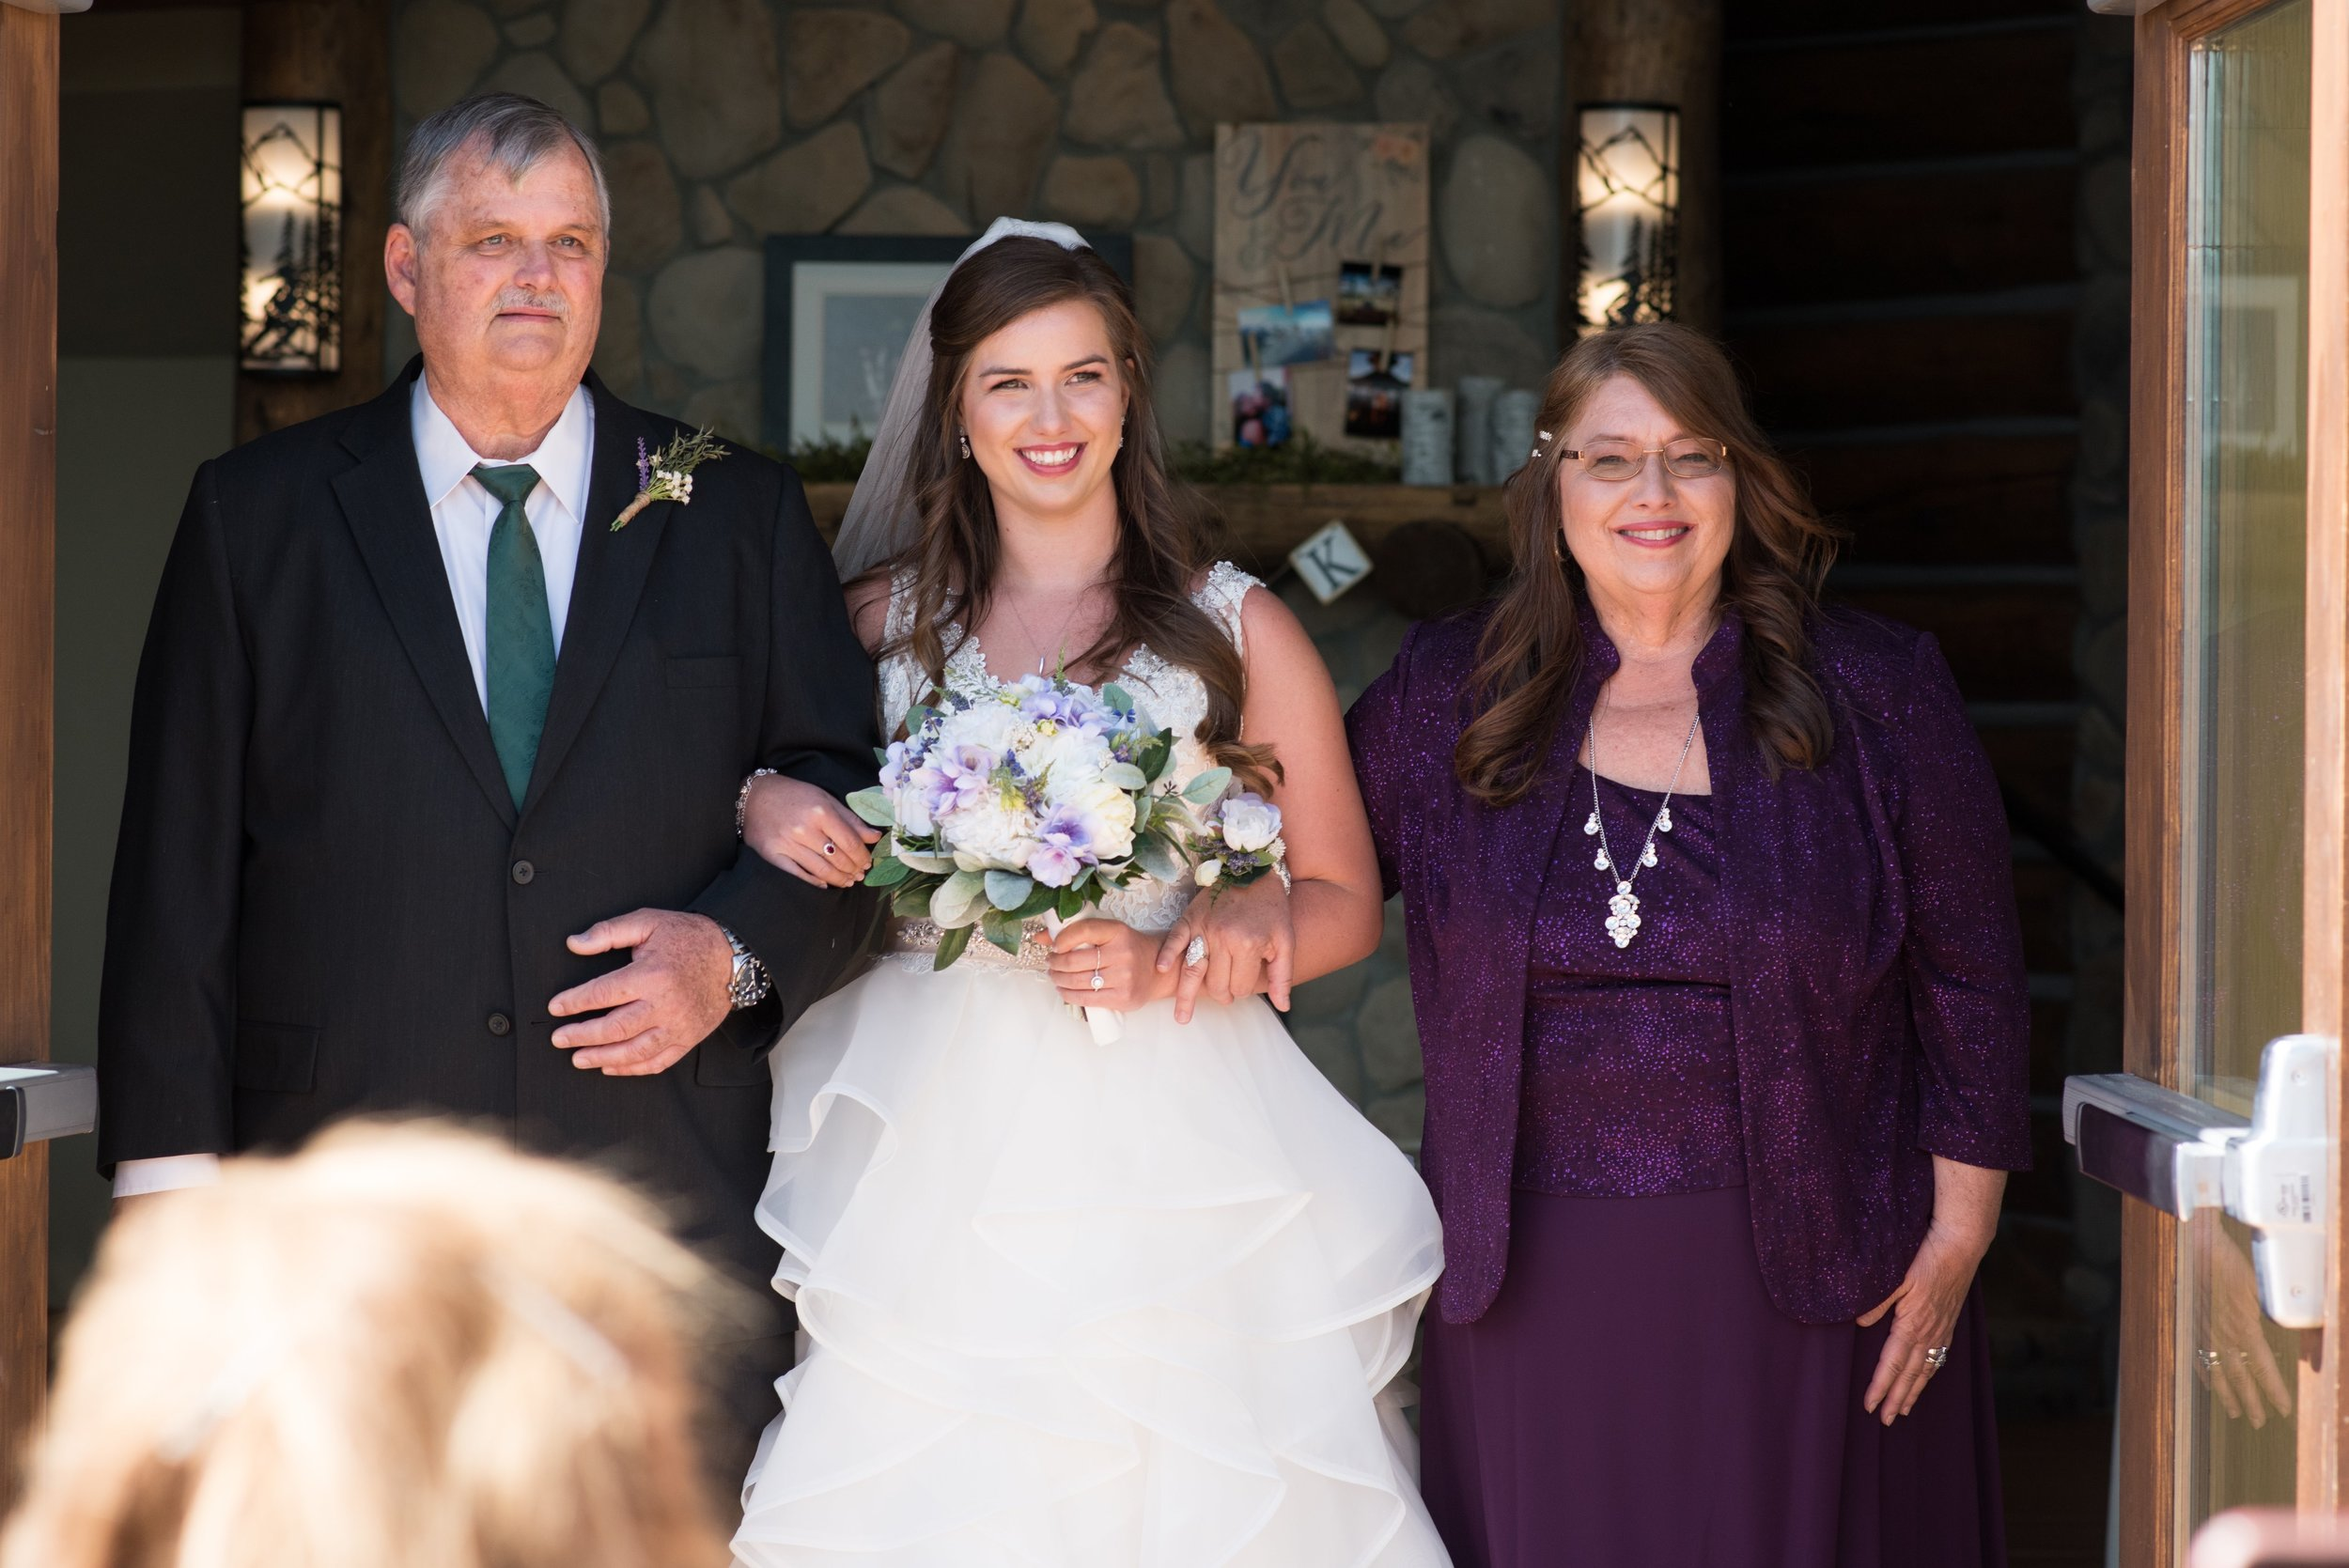 The Lodge at Breckenridge Wedding Ceremony